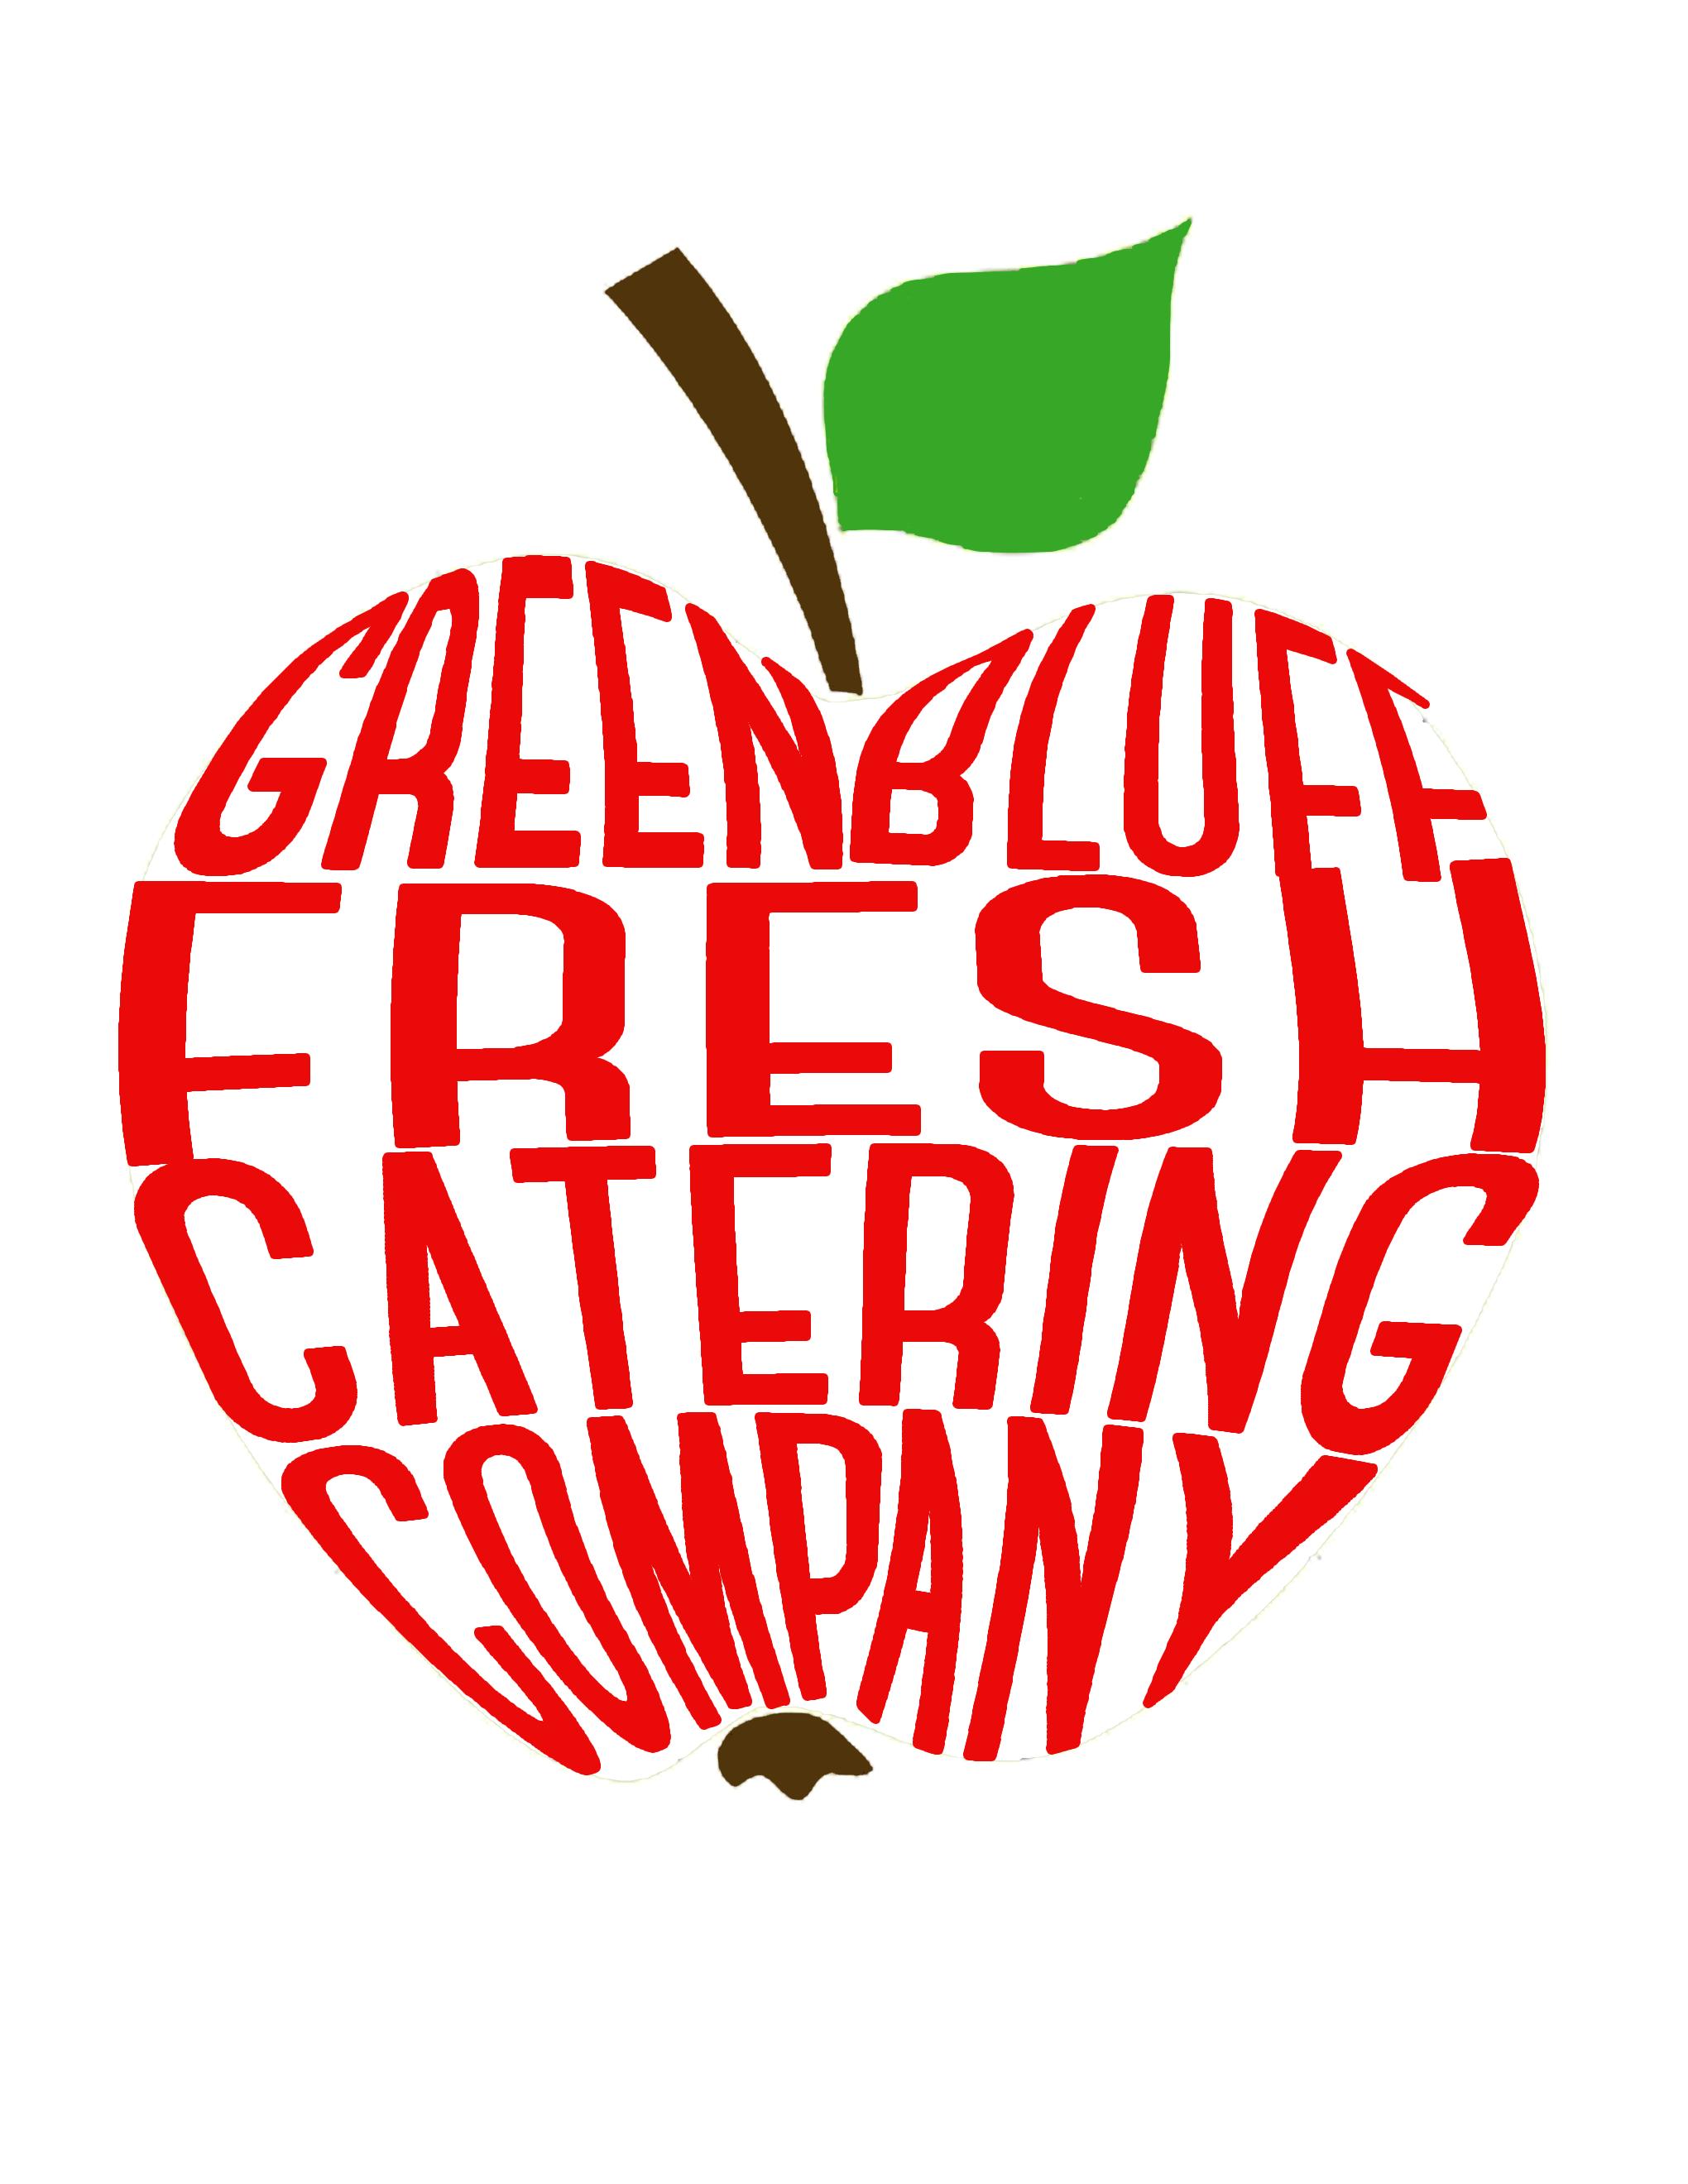 GreenbluffFresh.png